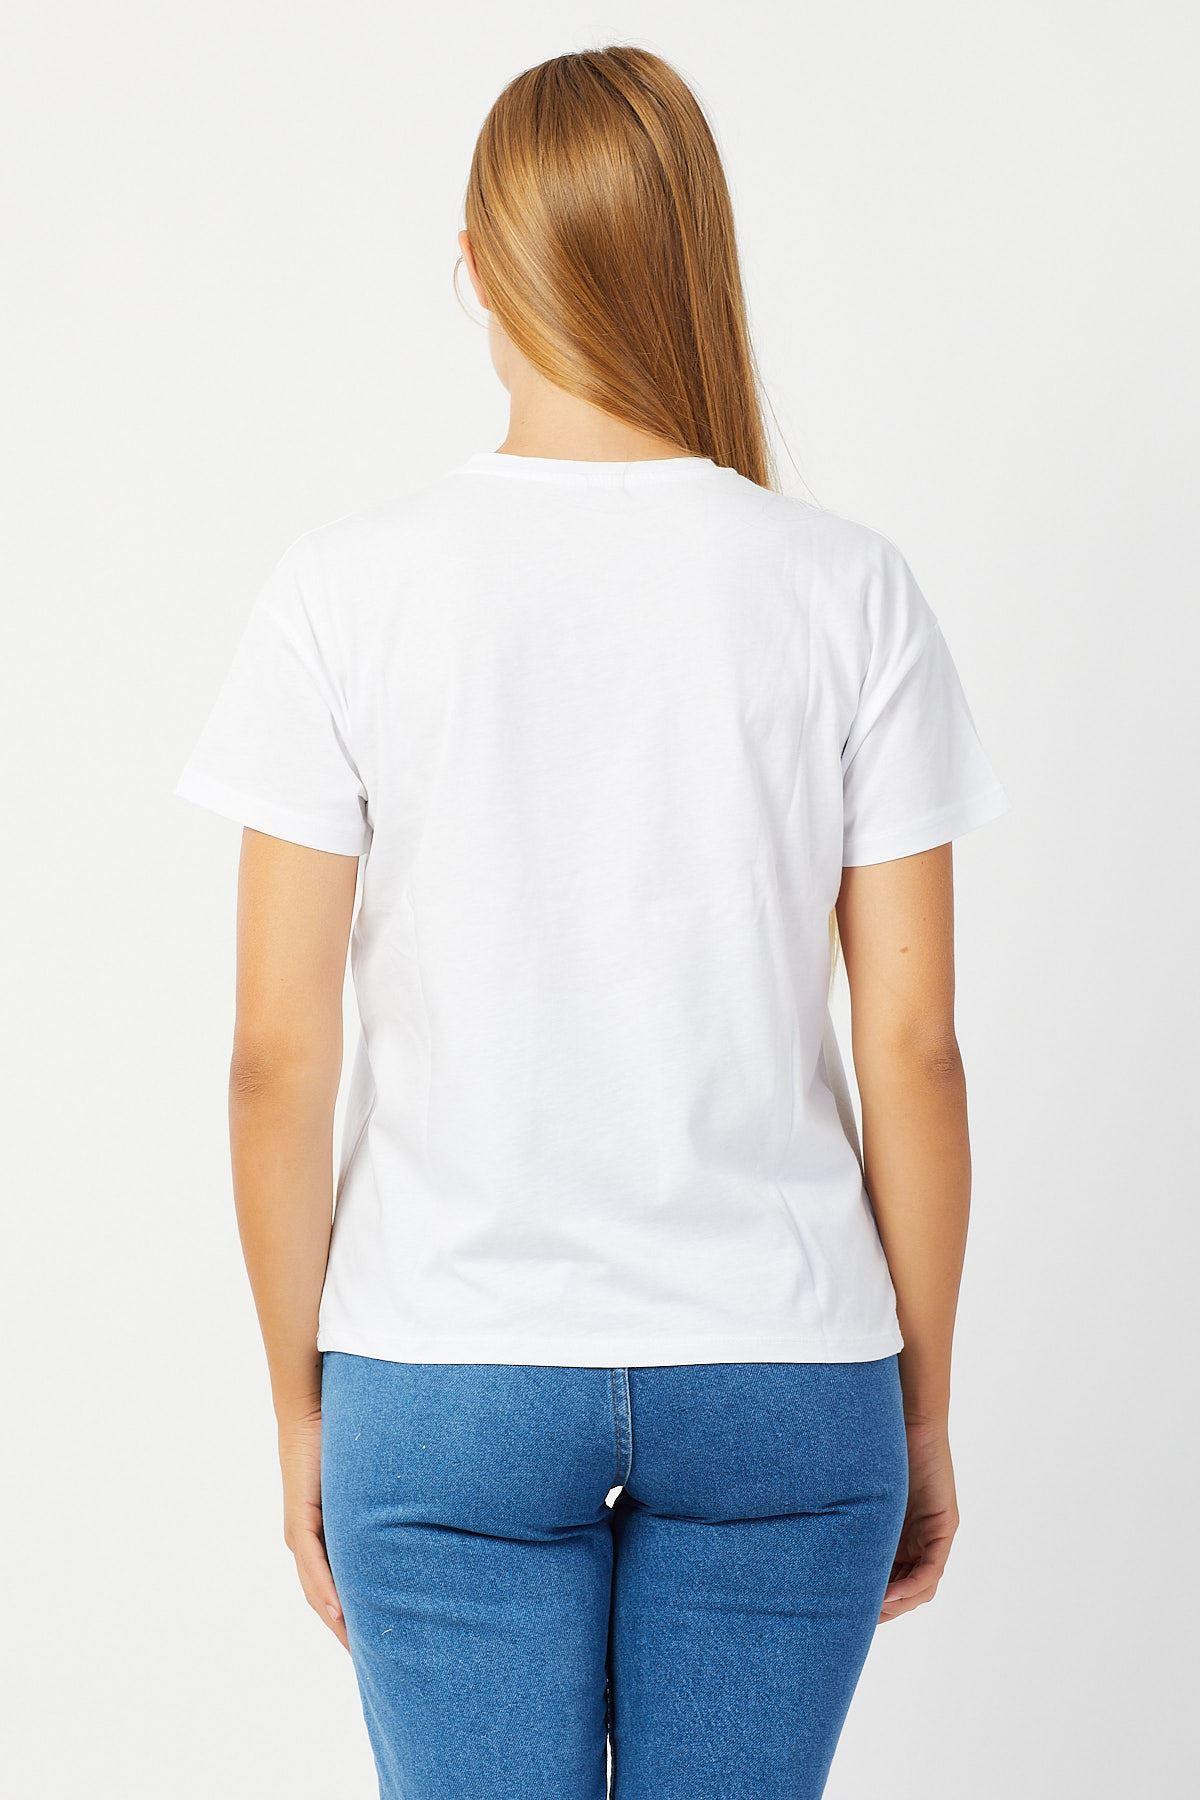 Minnie Baskılı T-shirt